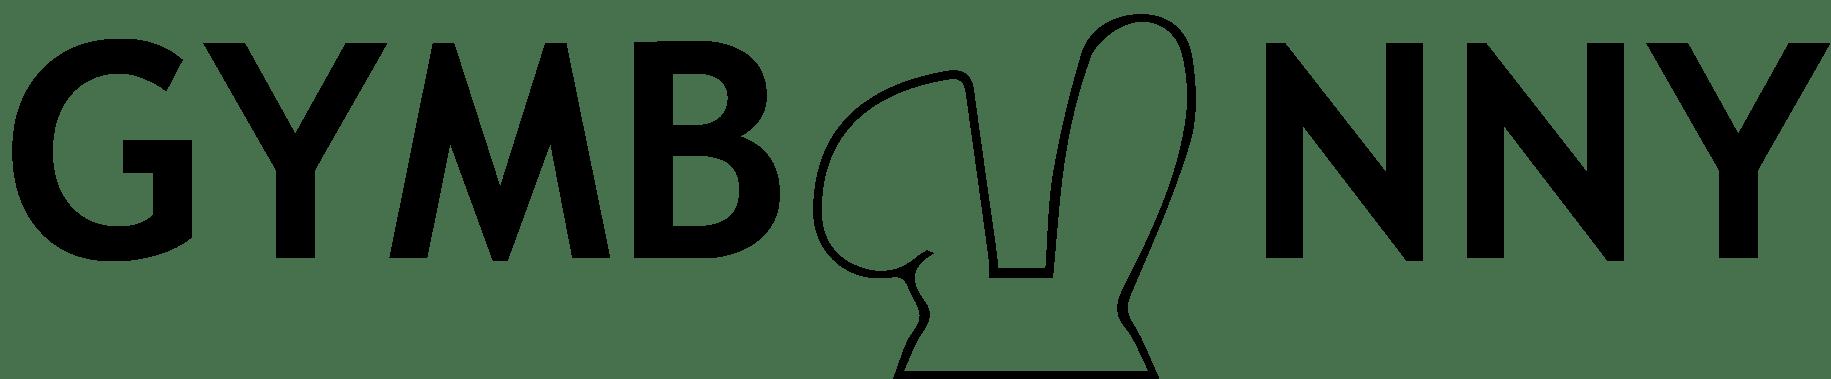 gym-bunny-black-logo